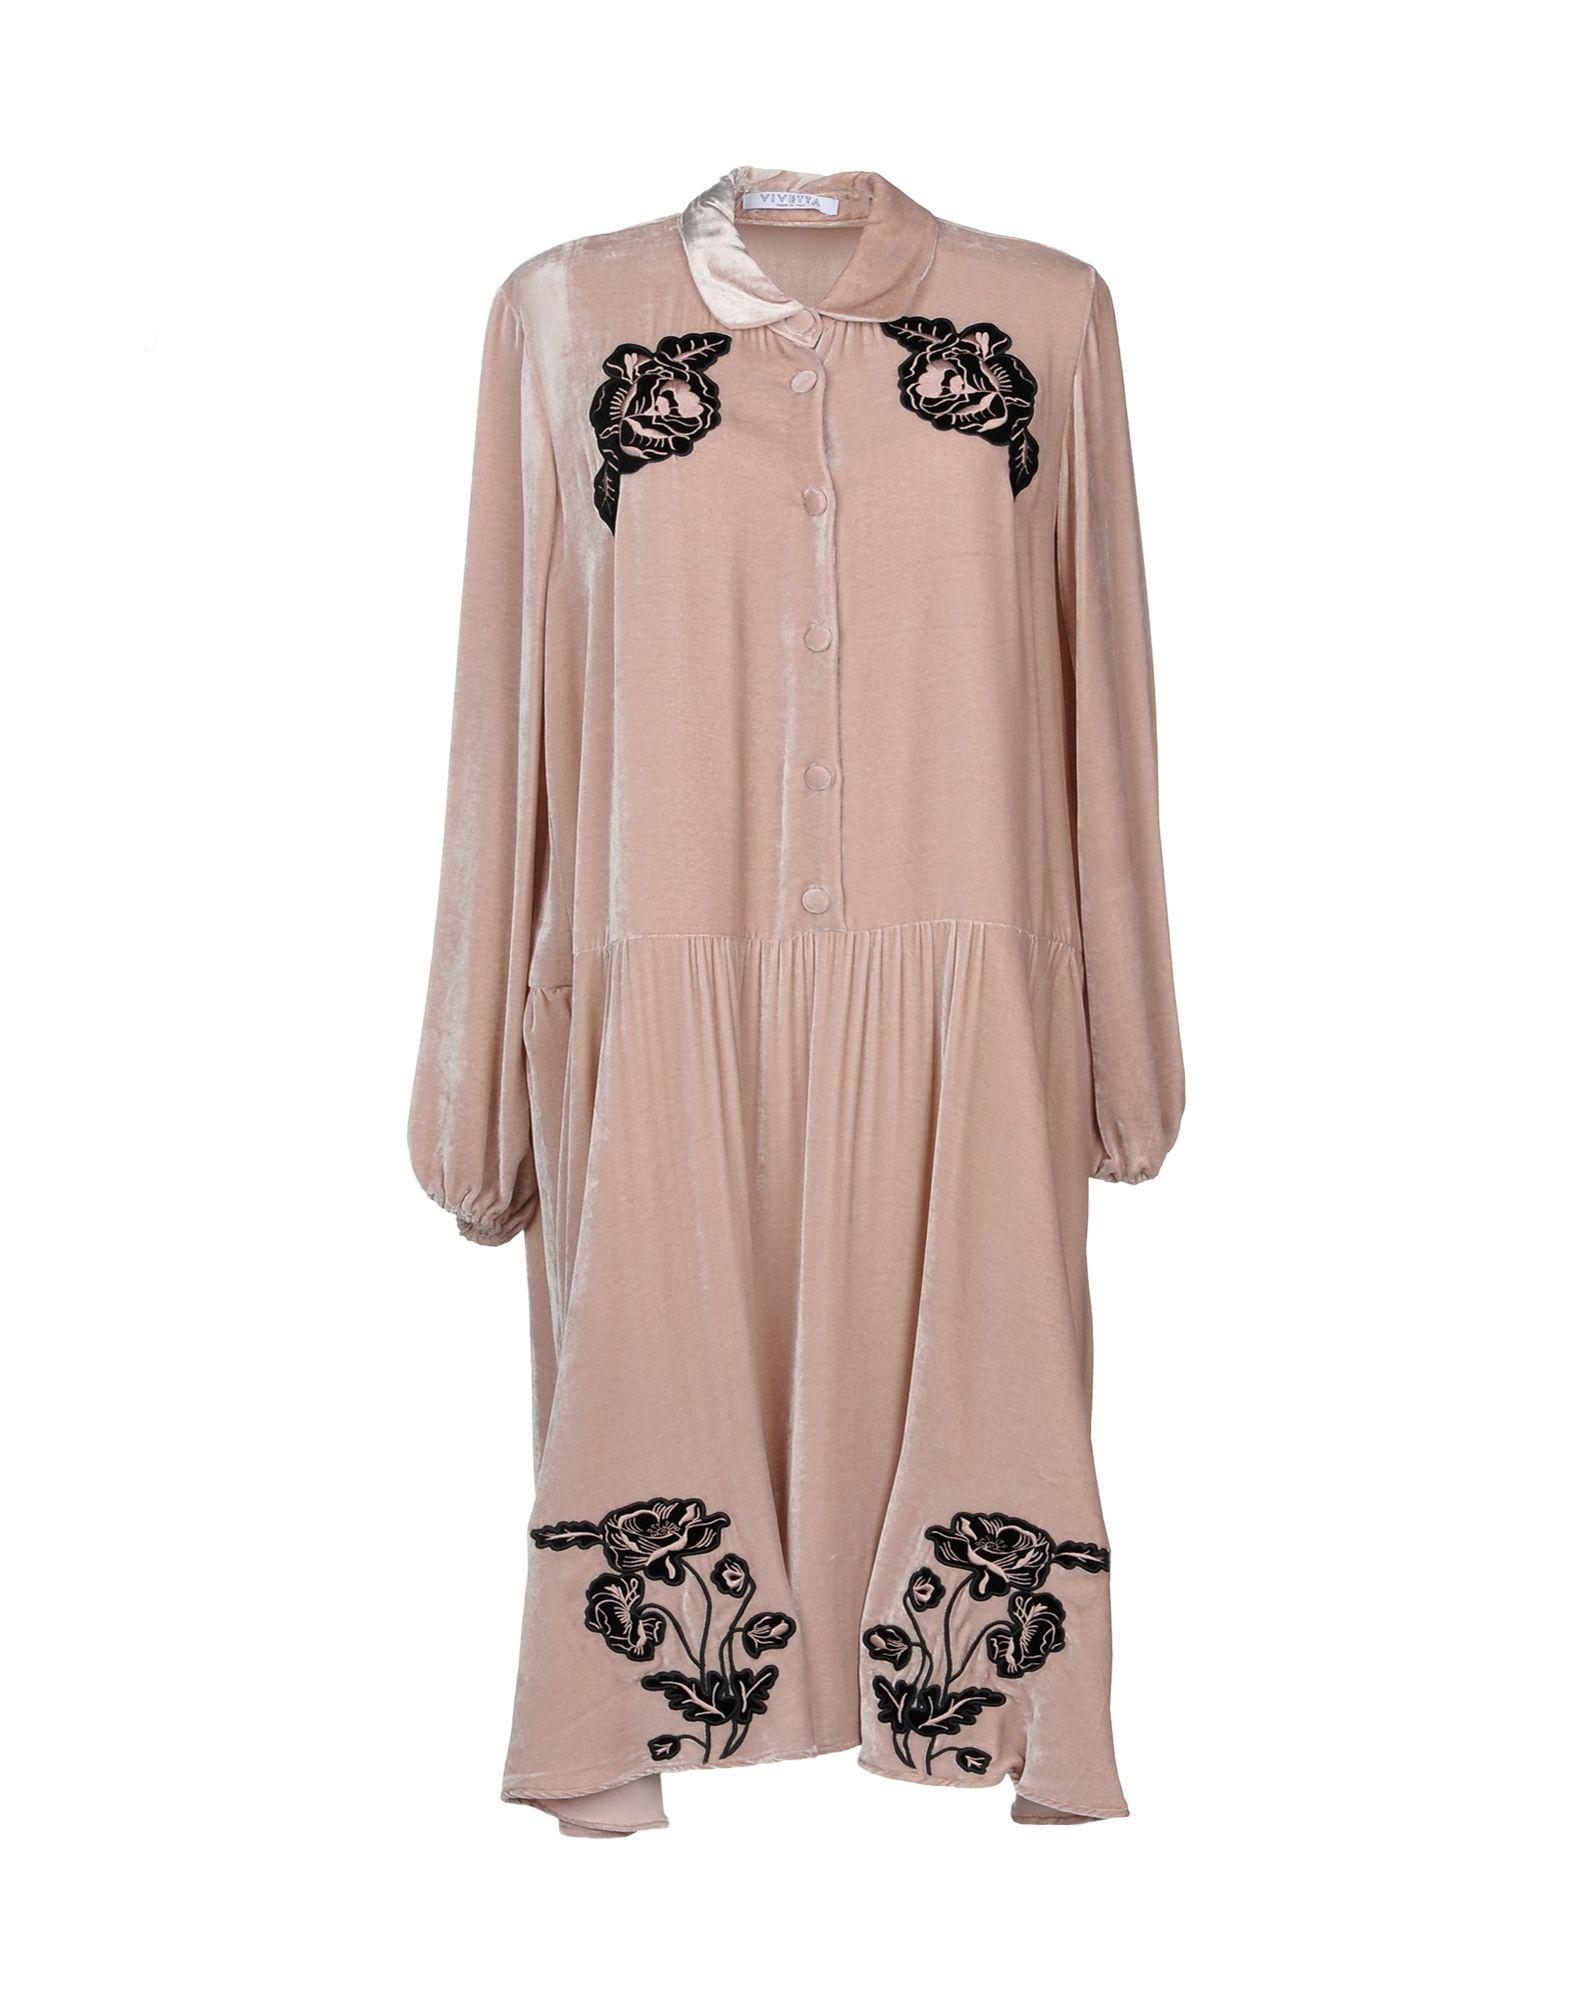 Vivetta Modesens Pale Length 34 In Dress Pink rPrRqCw